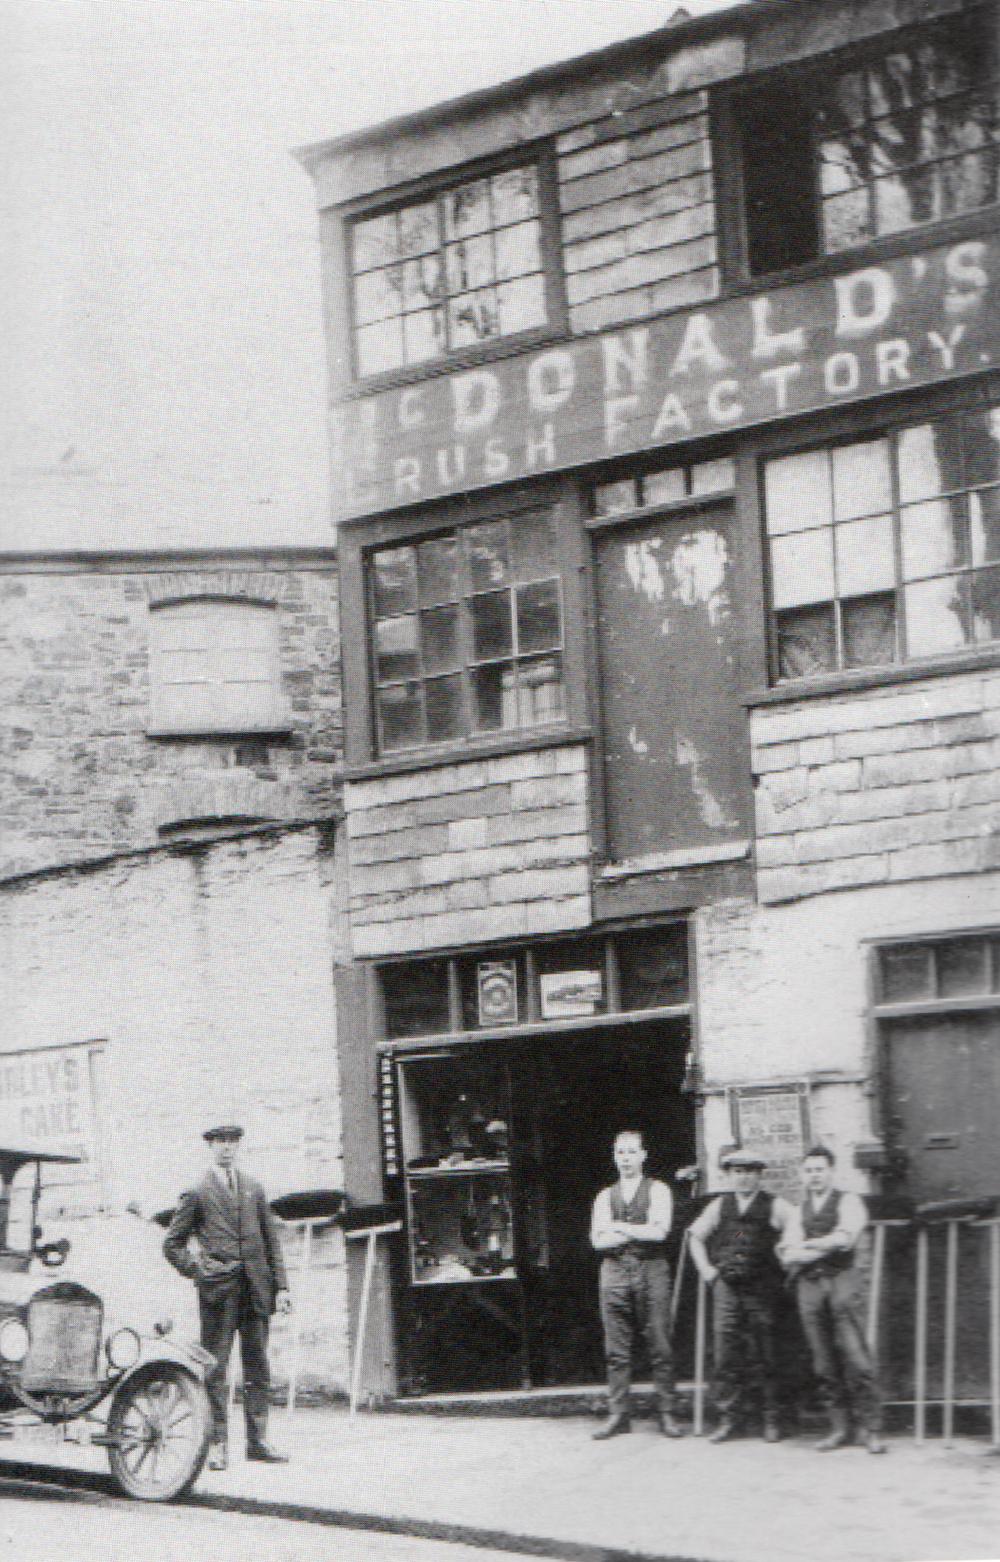 McDonald and Pyatt's brush factory at 1, Western Road.